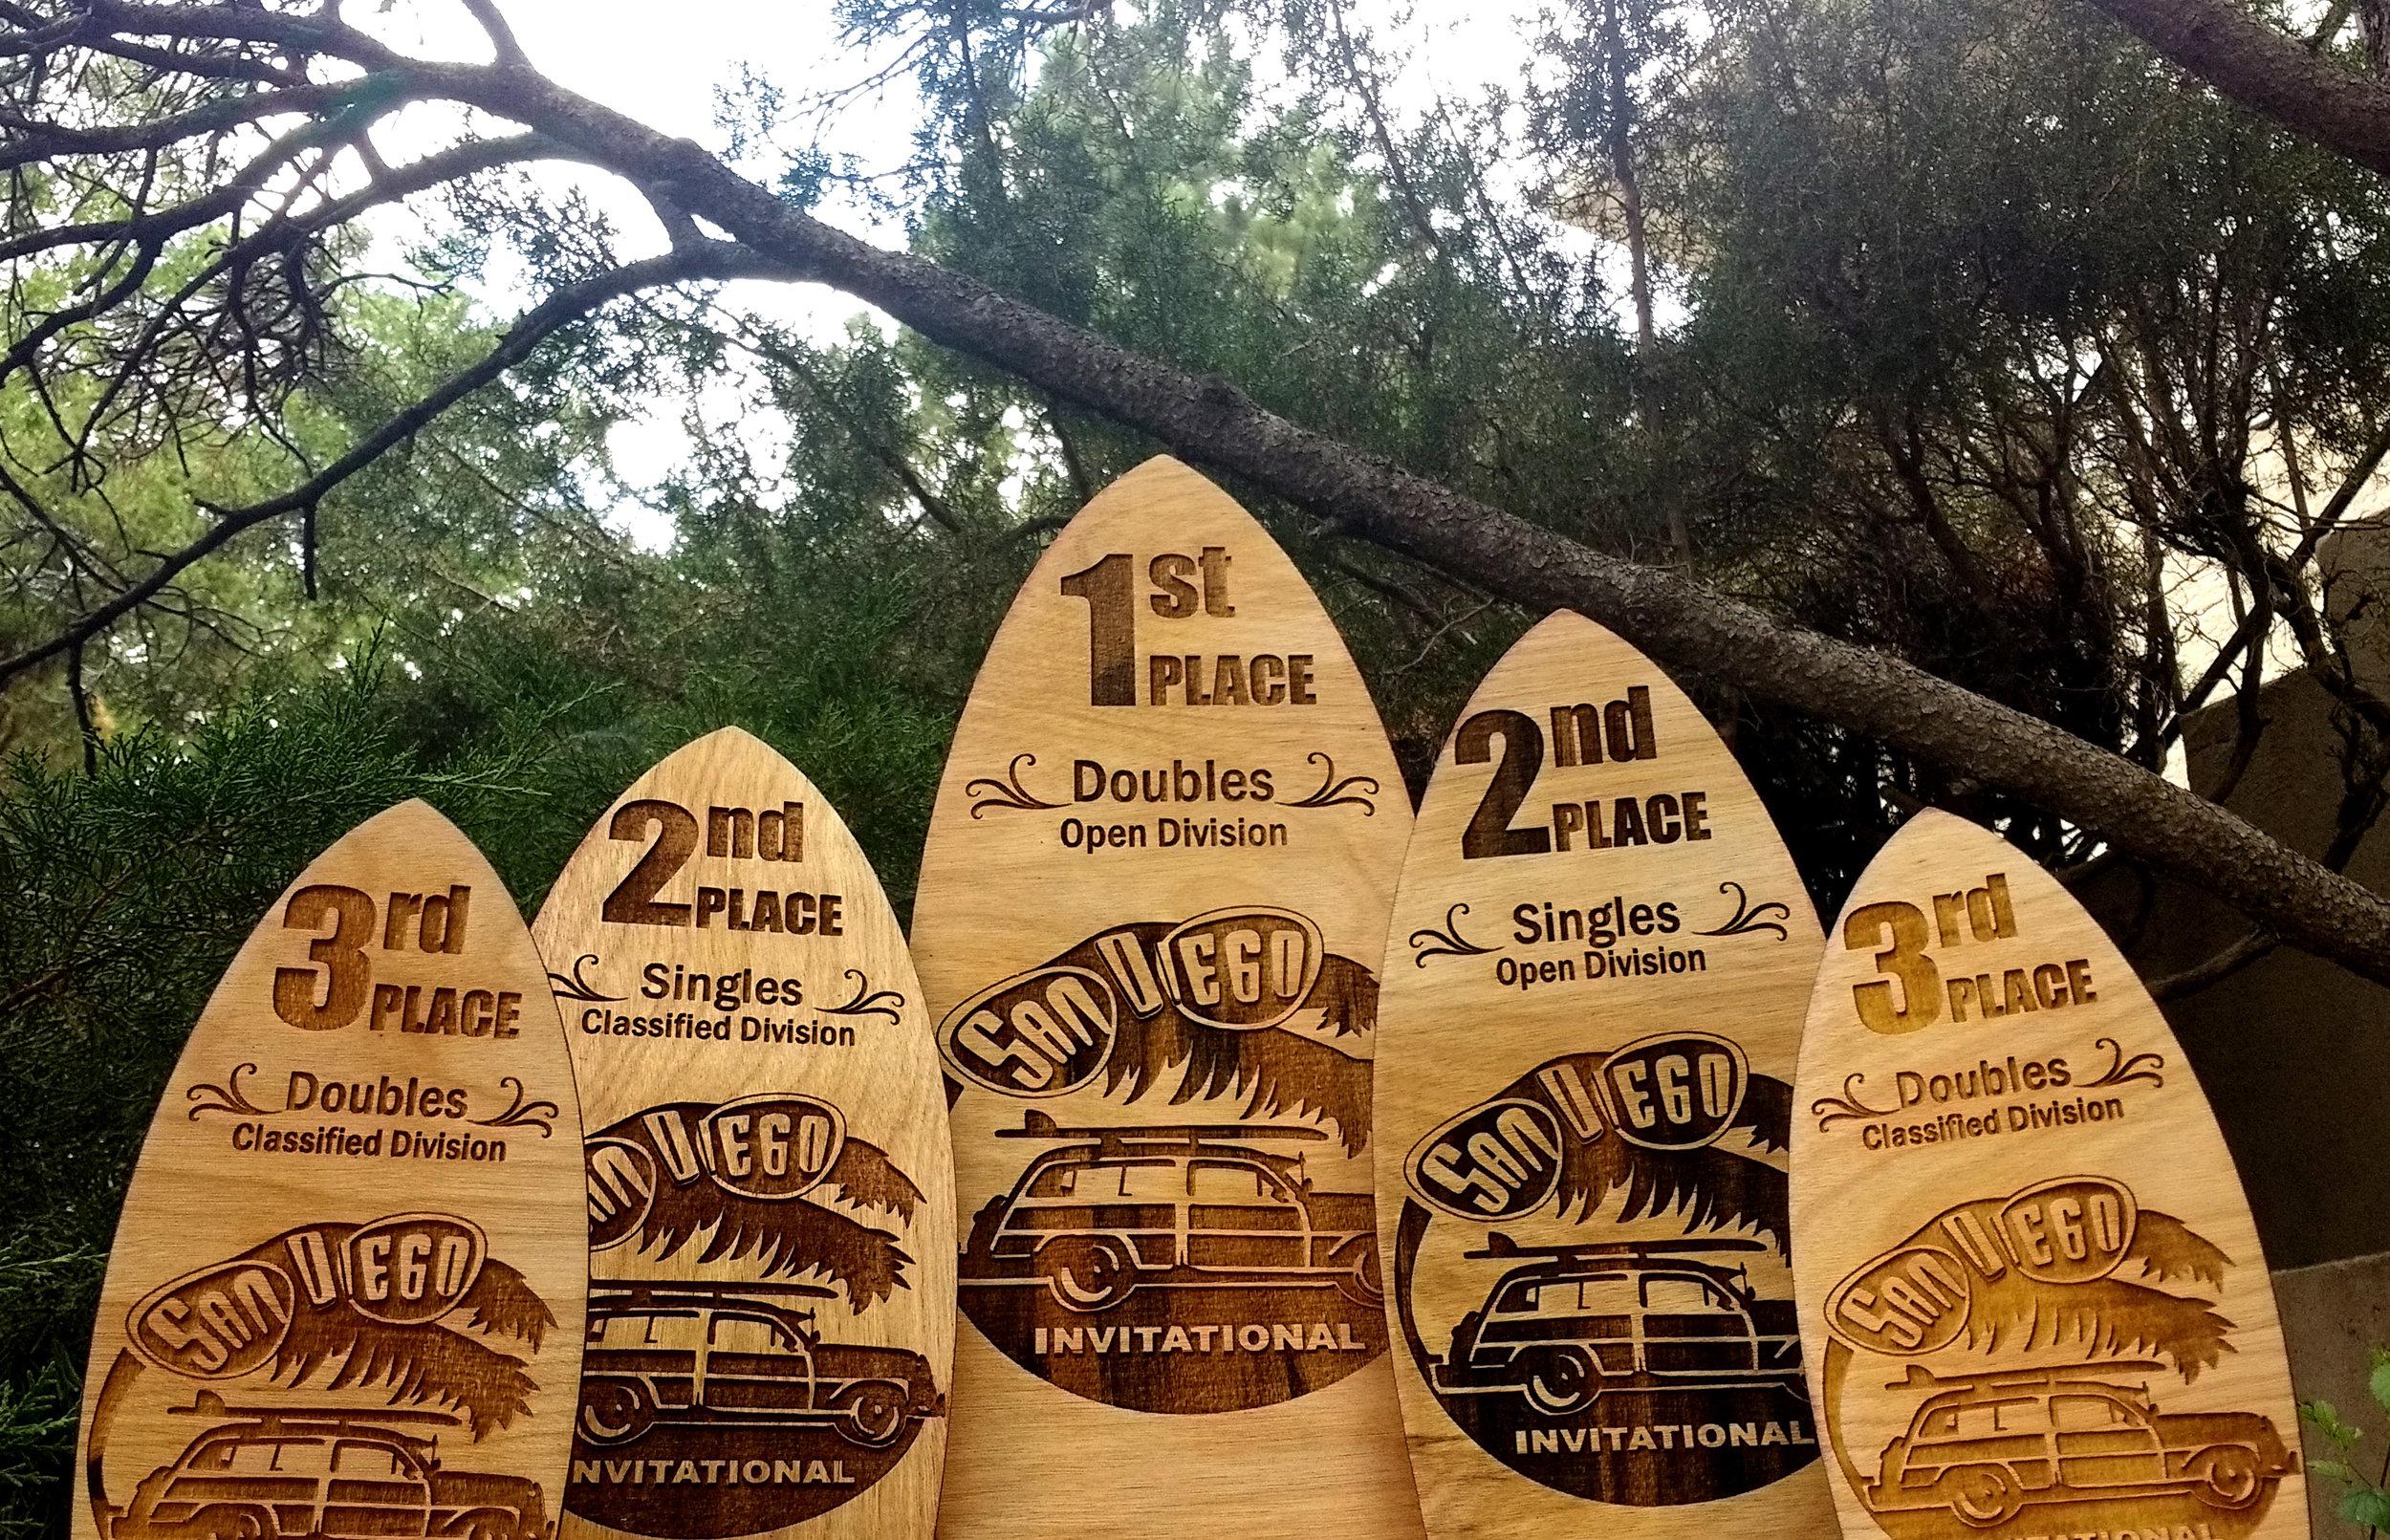 San Diego Bowling Trophies